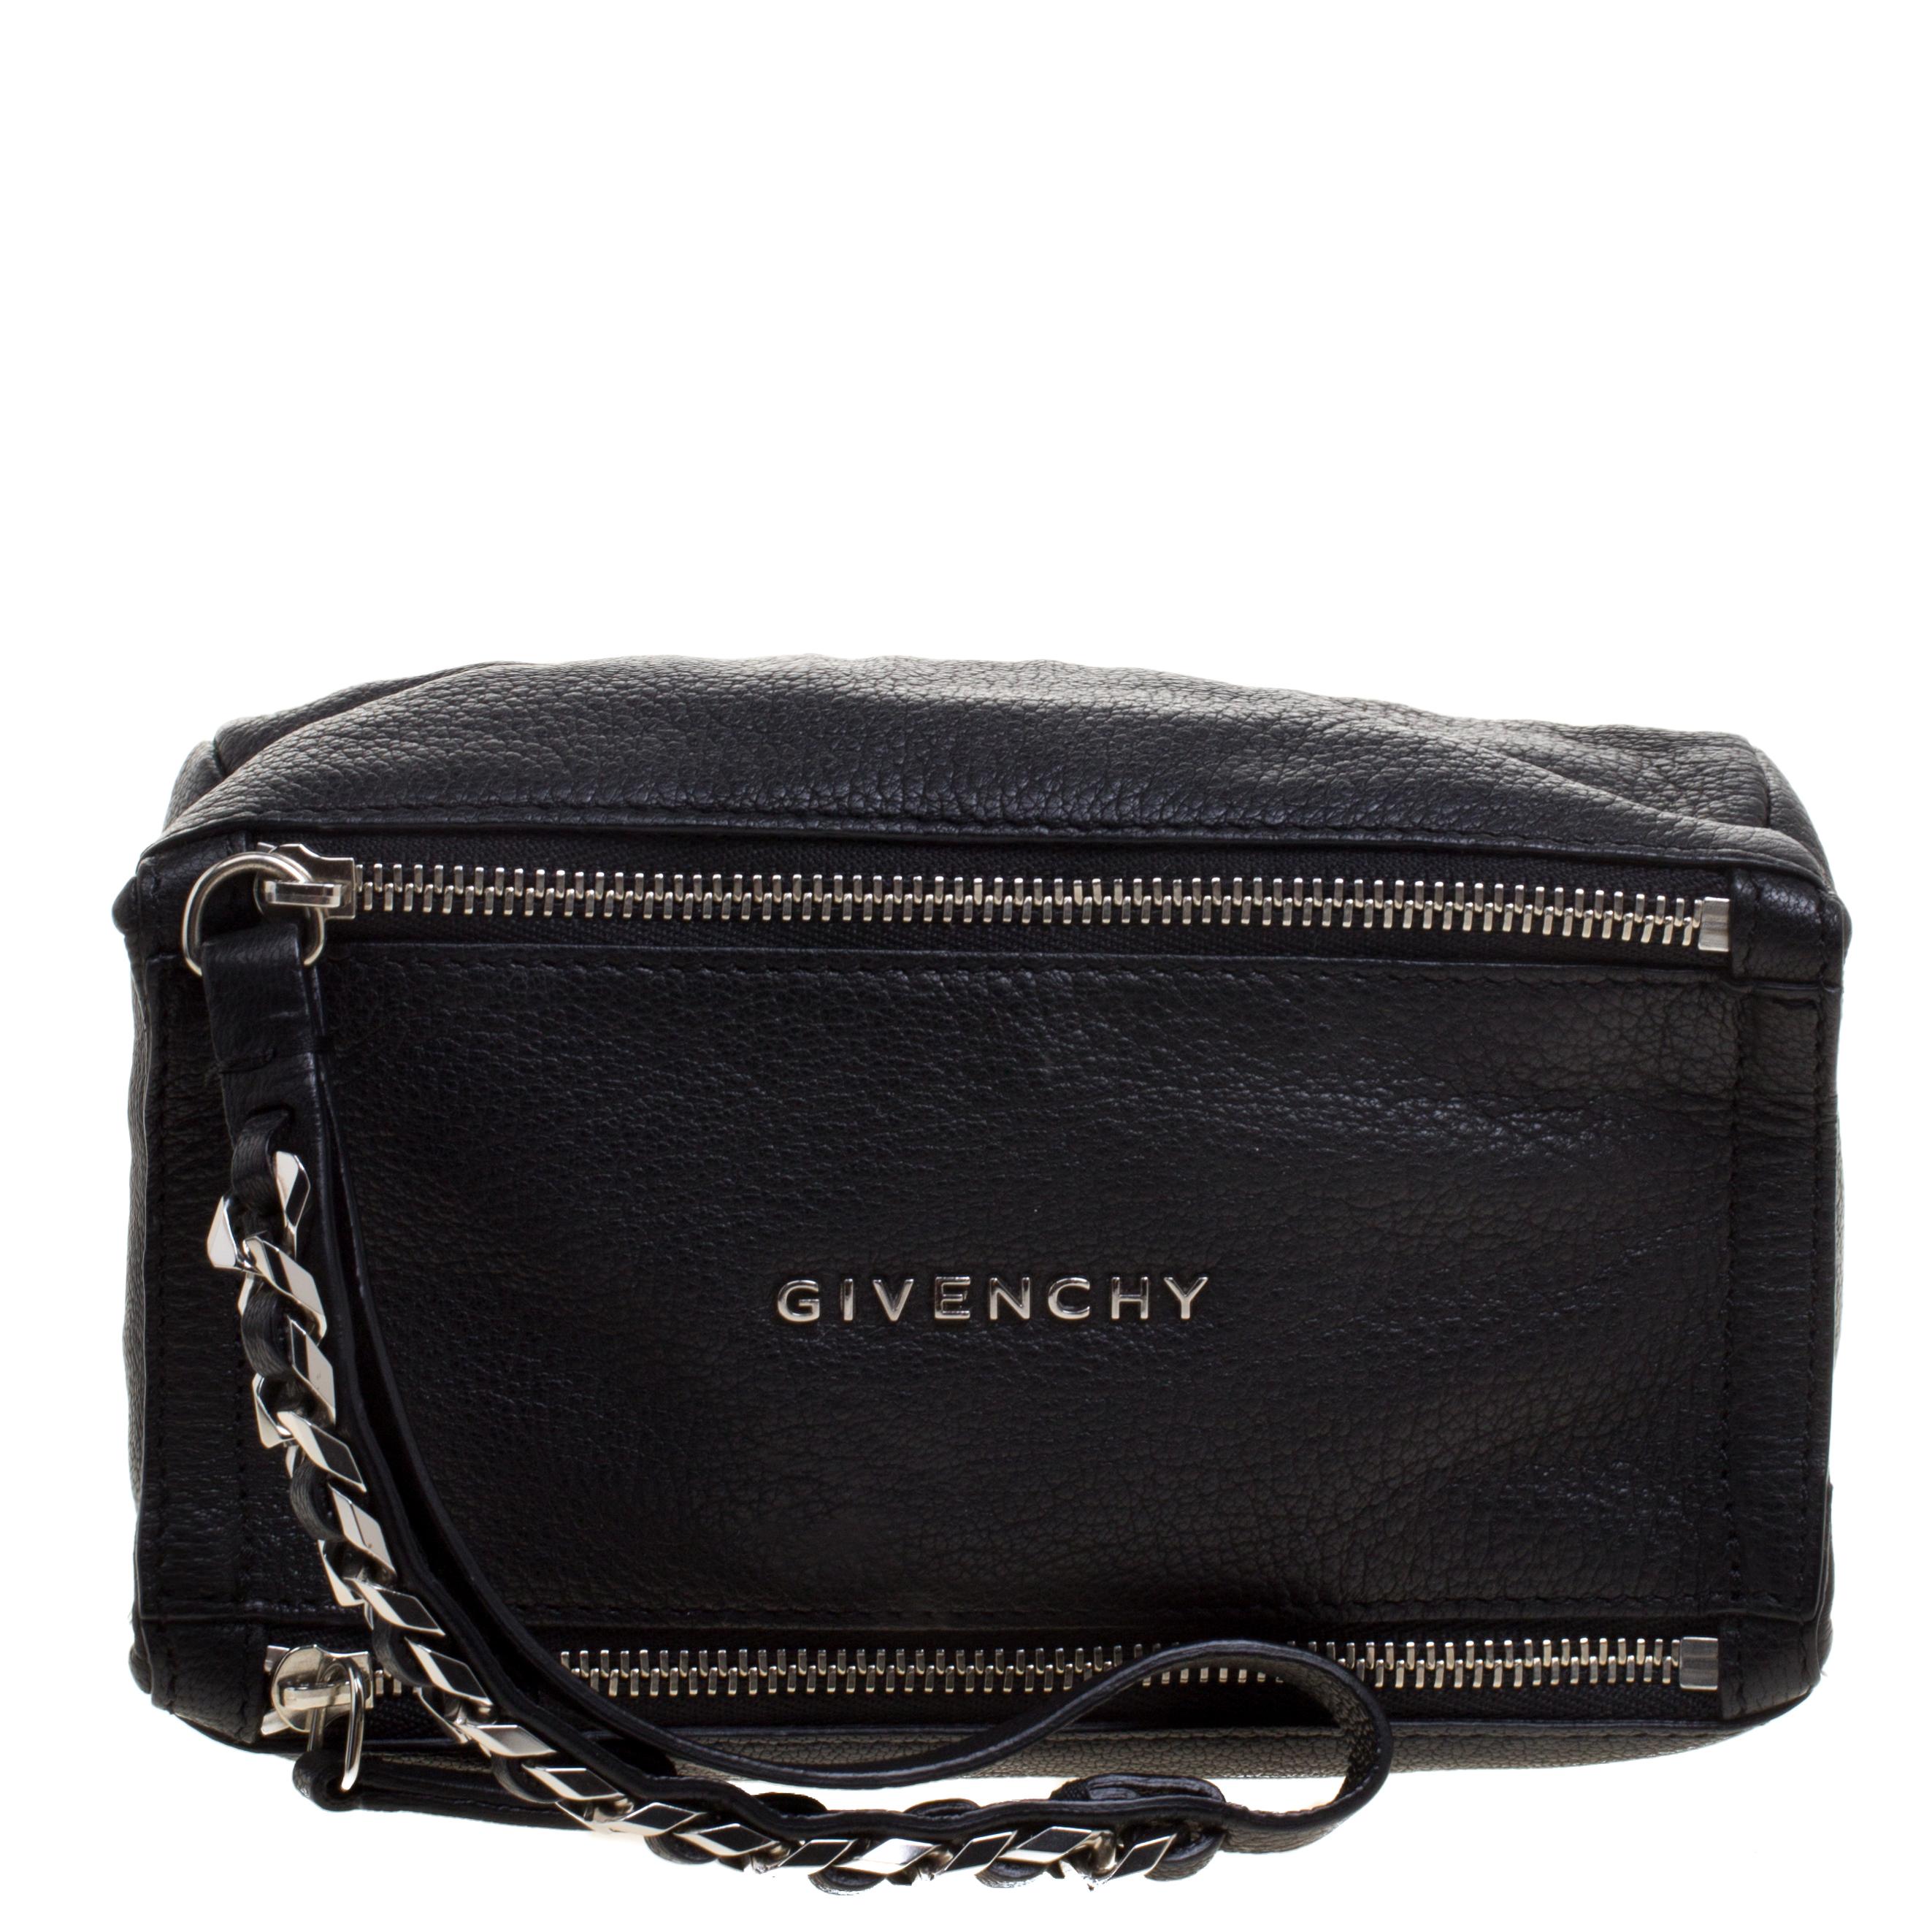 22911566b27 Buy Givenchy Black Leather Pandora Wristlet Clutch 110410 at best ...